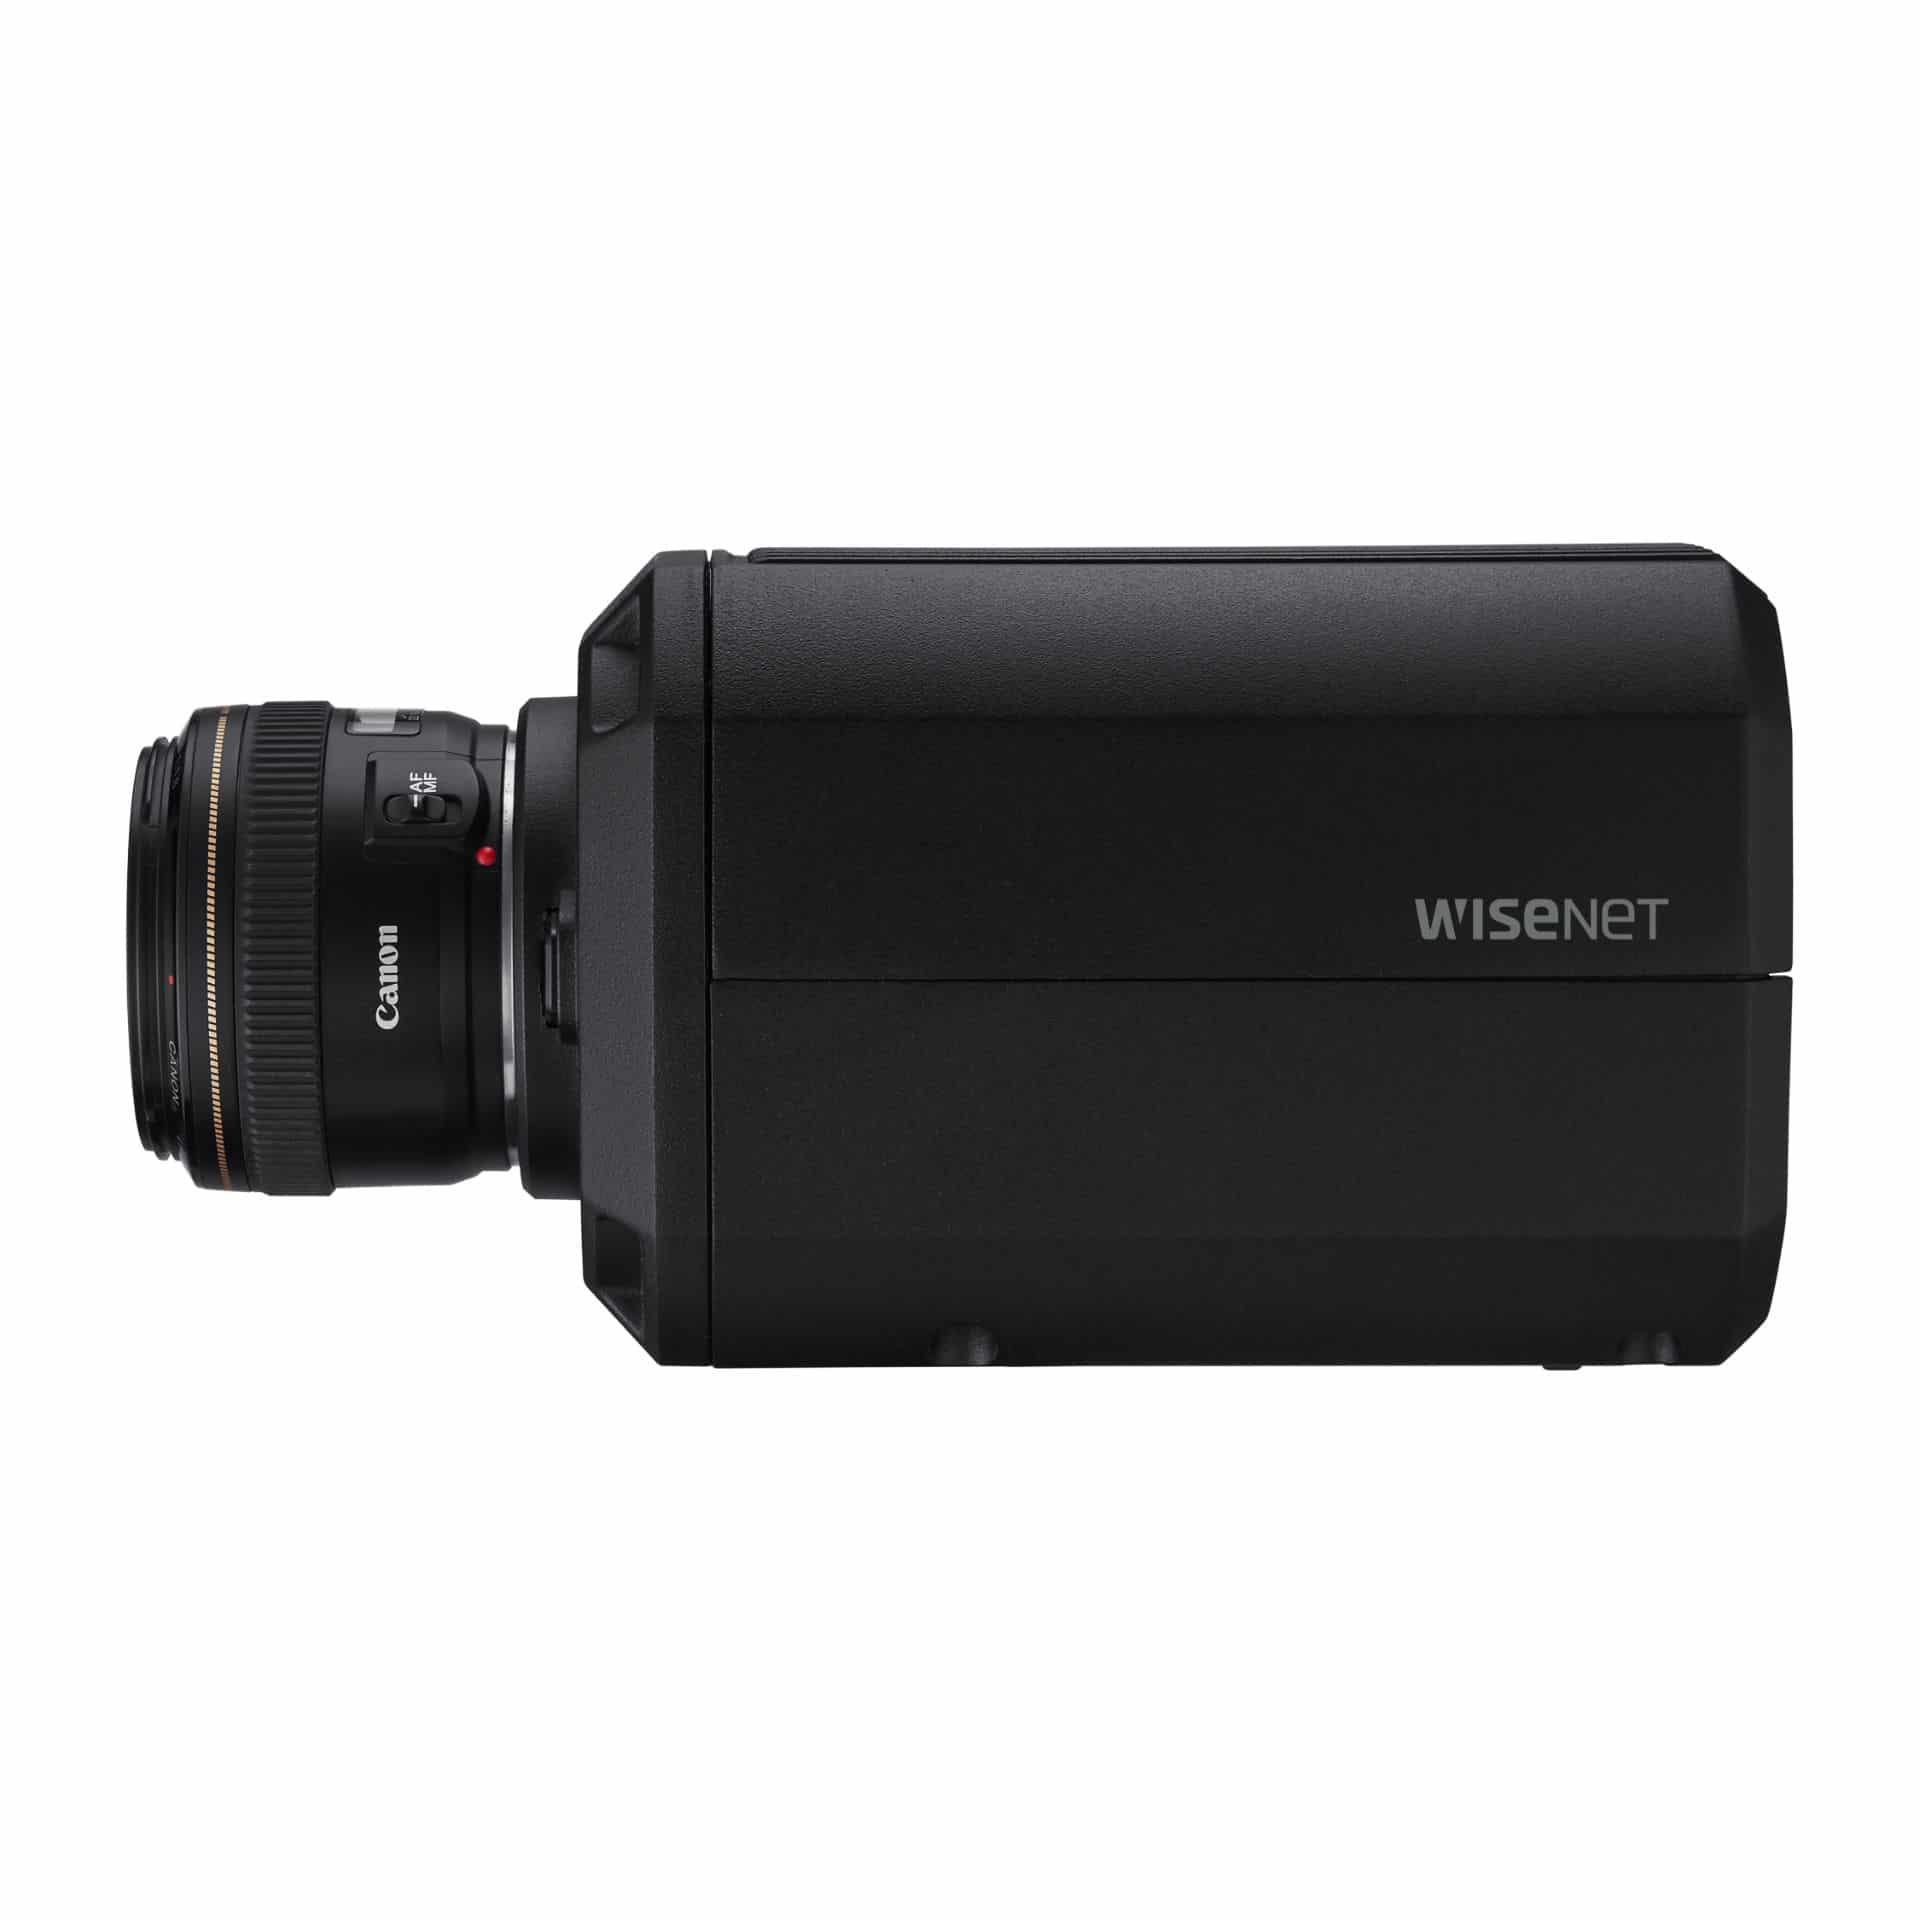 TNB-9000 8K Box Camera